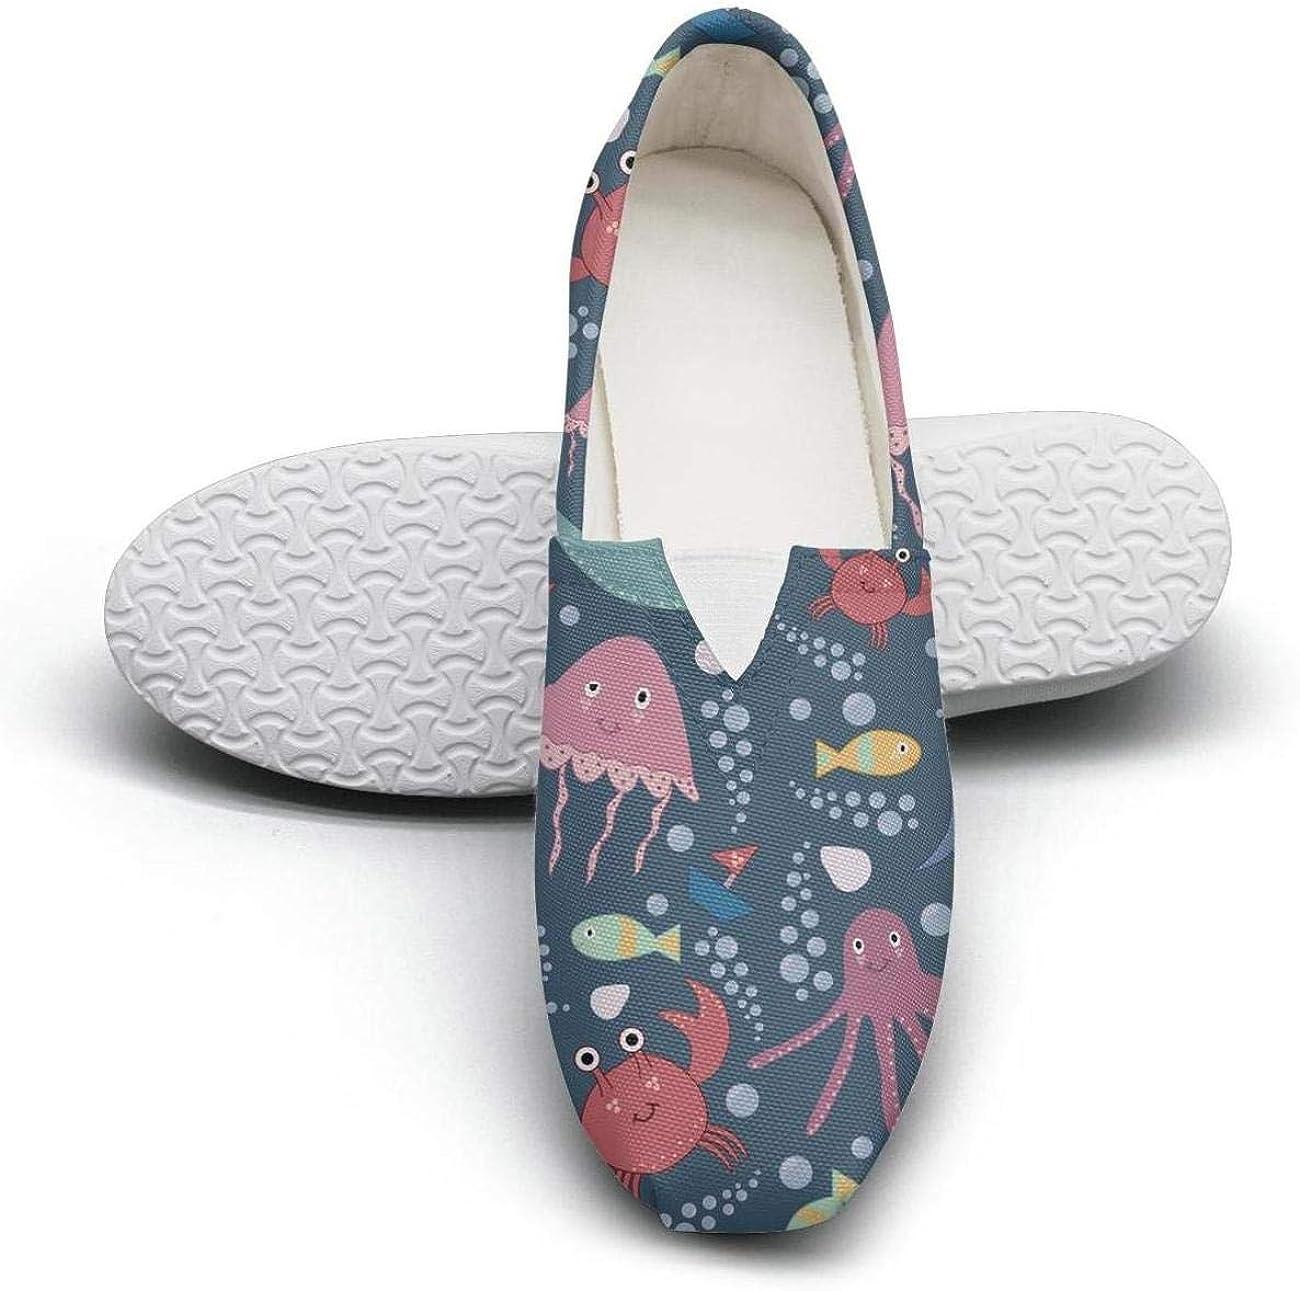 Blue Great Shark Classic Slip-ONS Women's Extra Light Flat Boat Shoes Girls Espadrille Flats